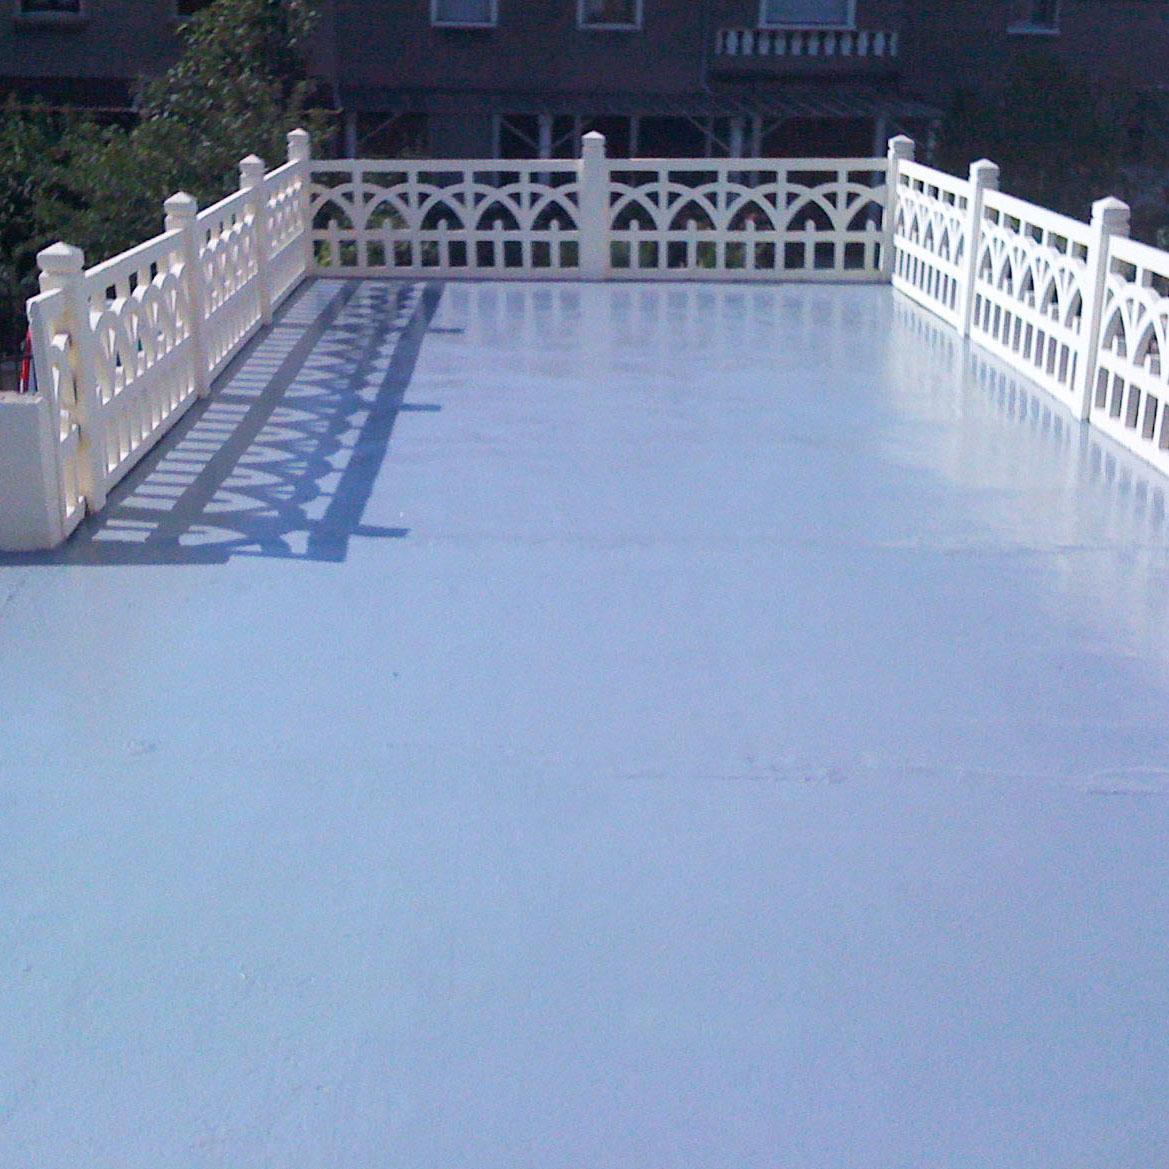 Roc etanche peinture toiture or peinture peinture pro for Peinture sol exterieur etanche